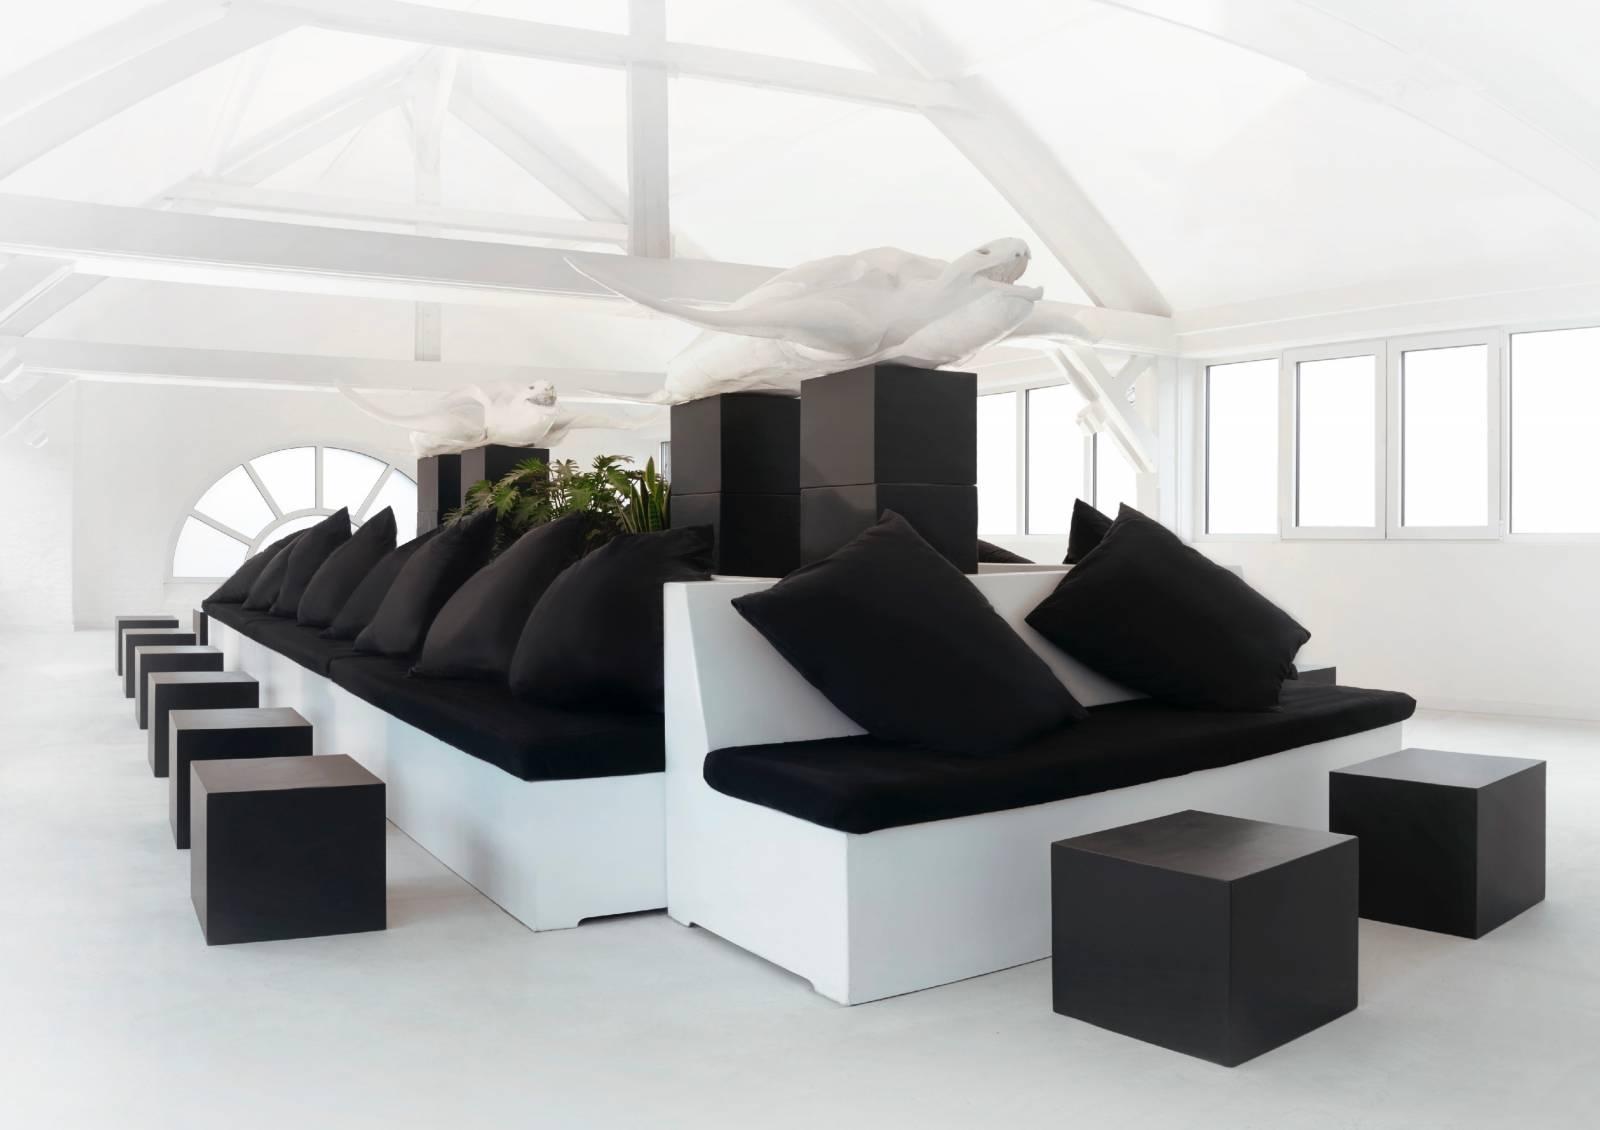 Zaal Lux - Feestzaal -  House of Weddings - 34